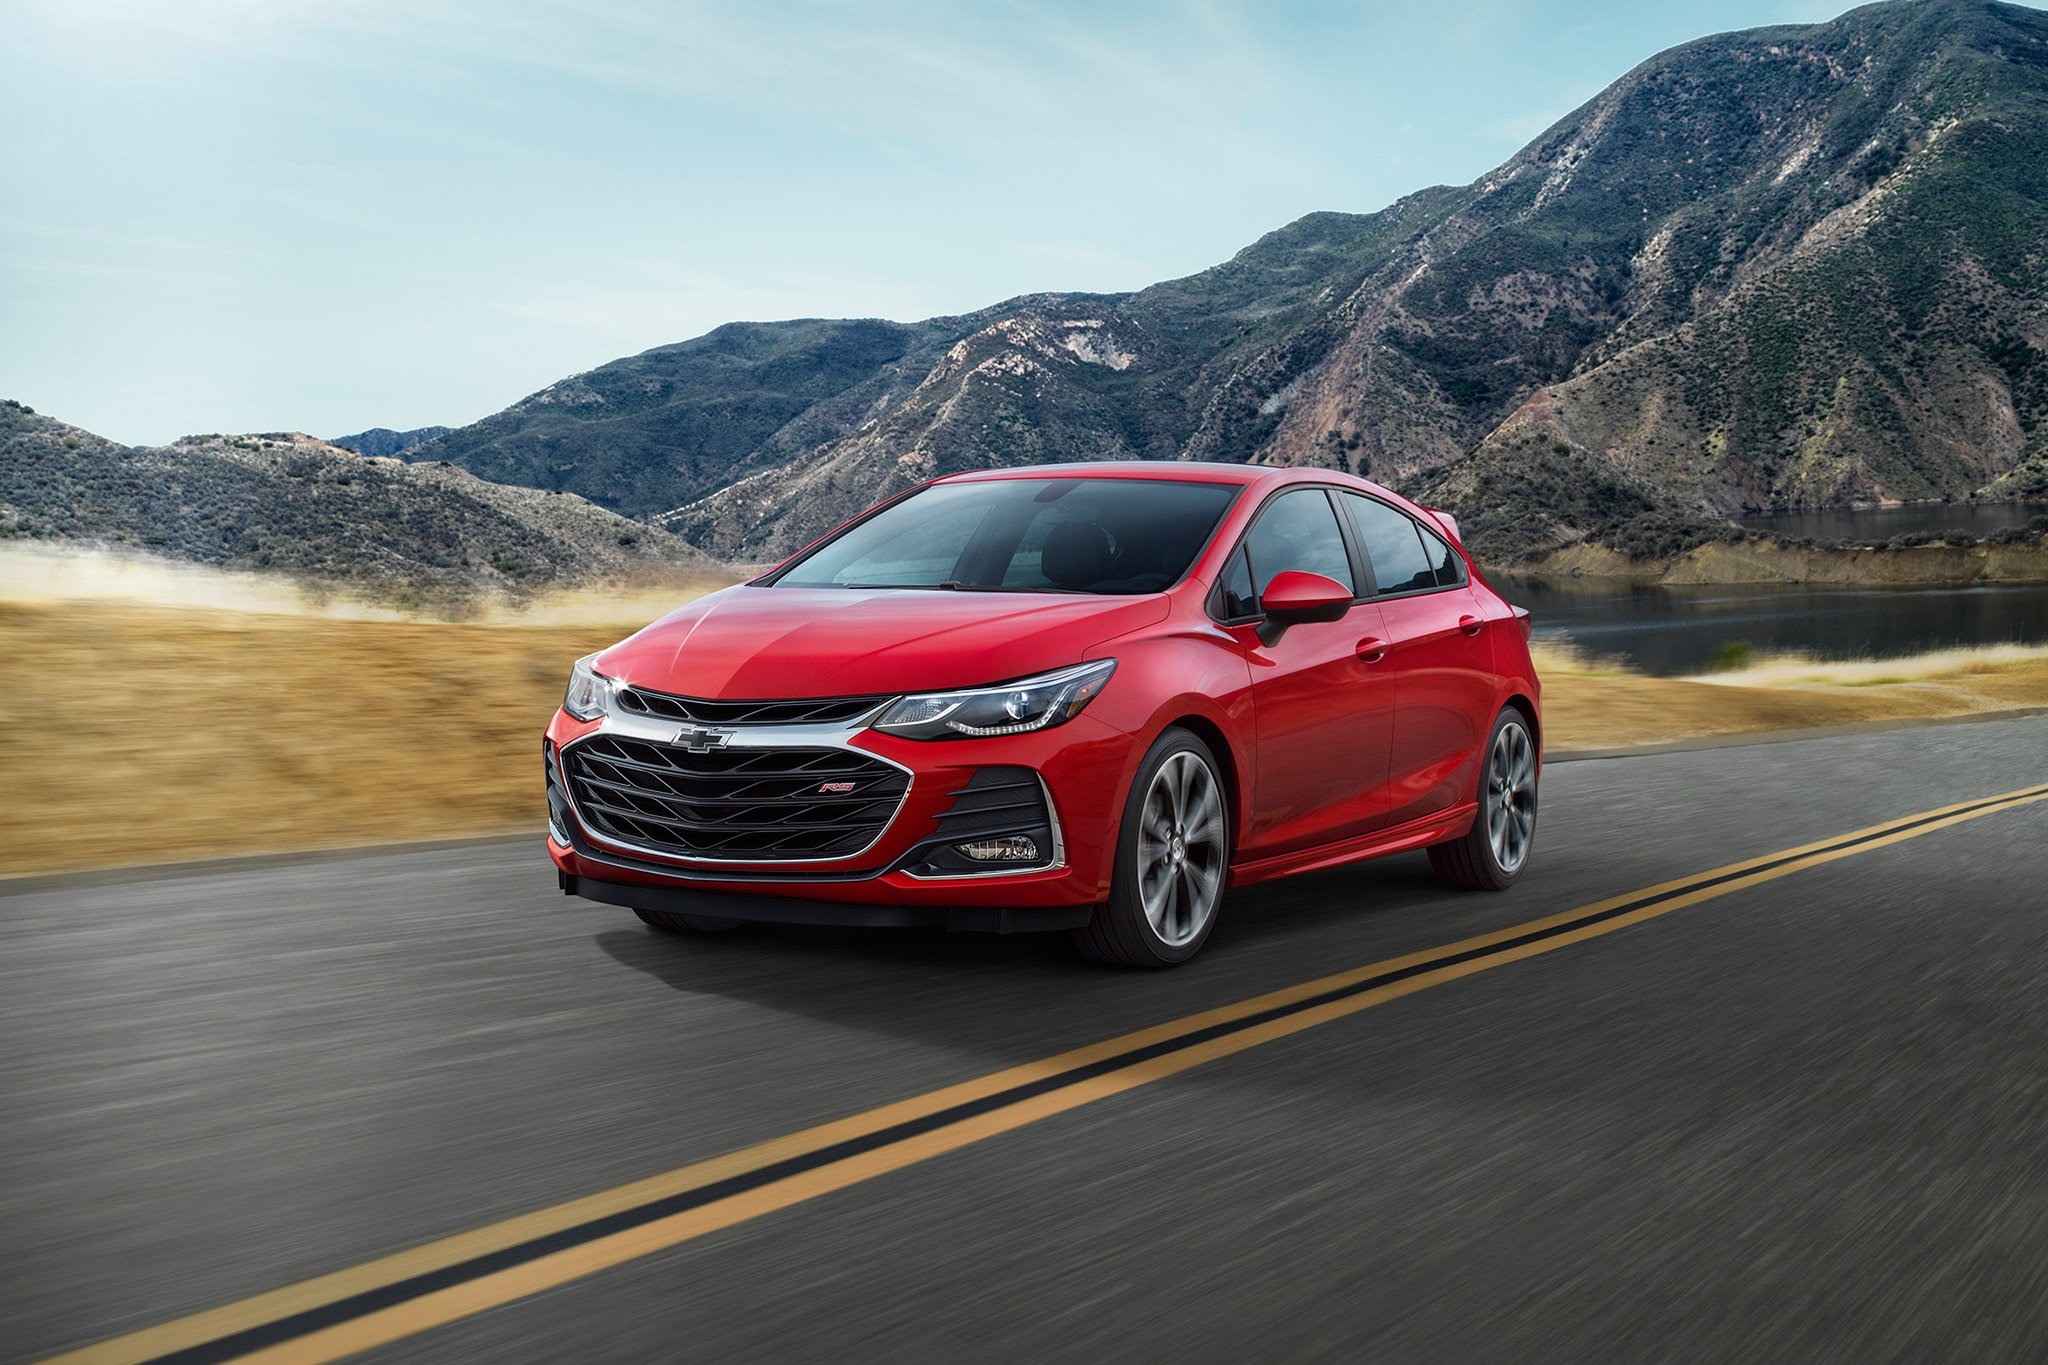 2019 Chevrolet Cruze, Malibu, and Spark Show Their Teeth ...